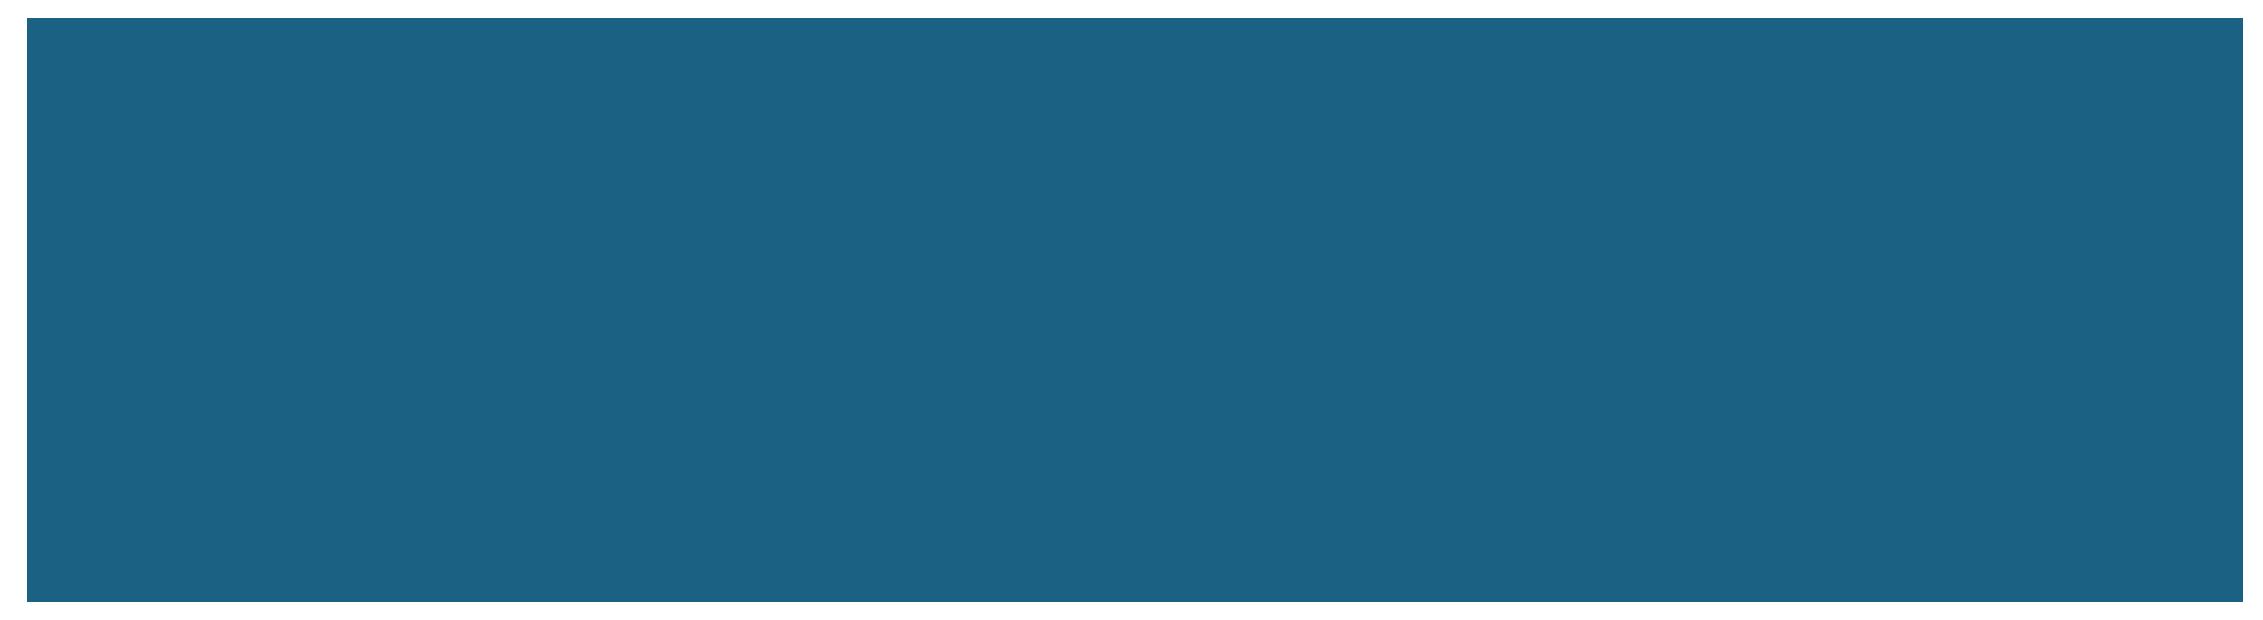 City of Tampa Water Main Improvements Project Logo